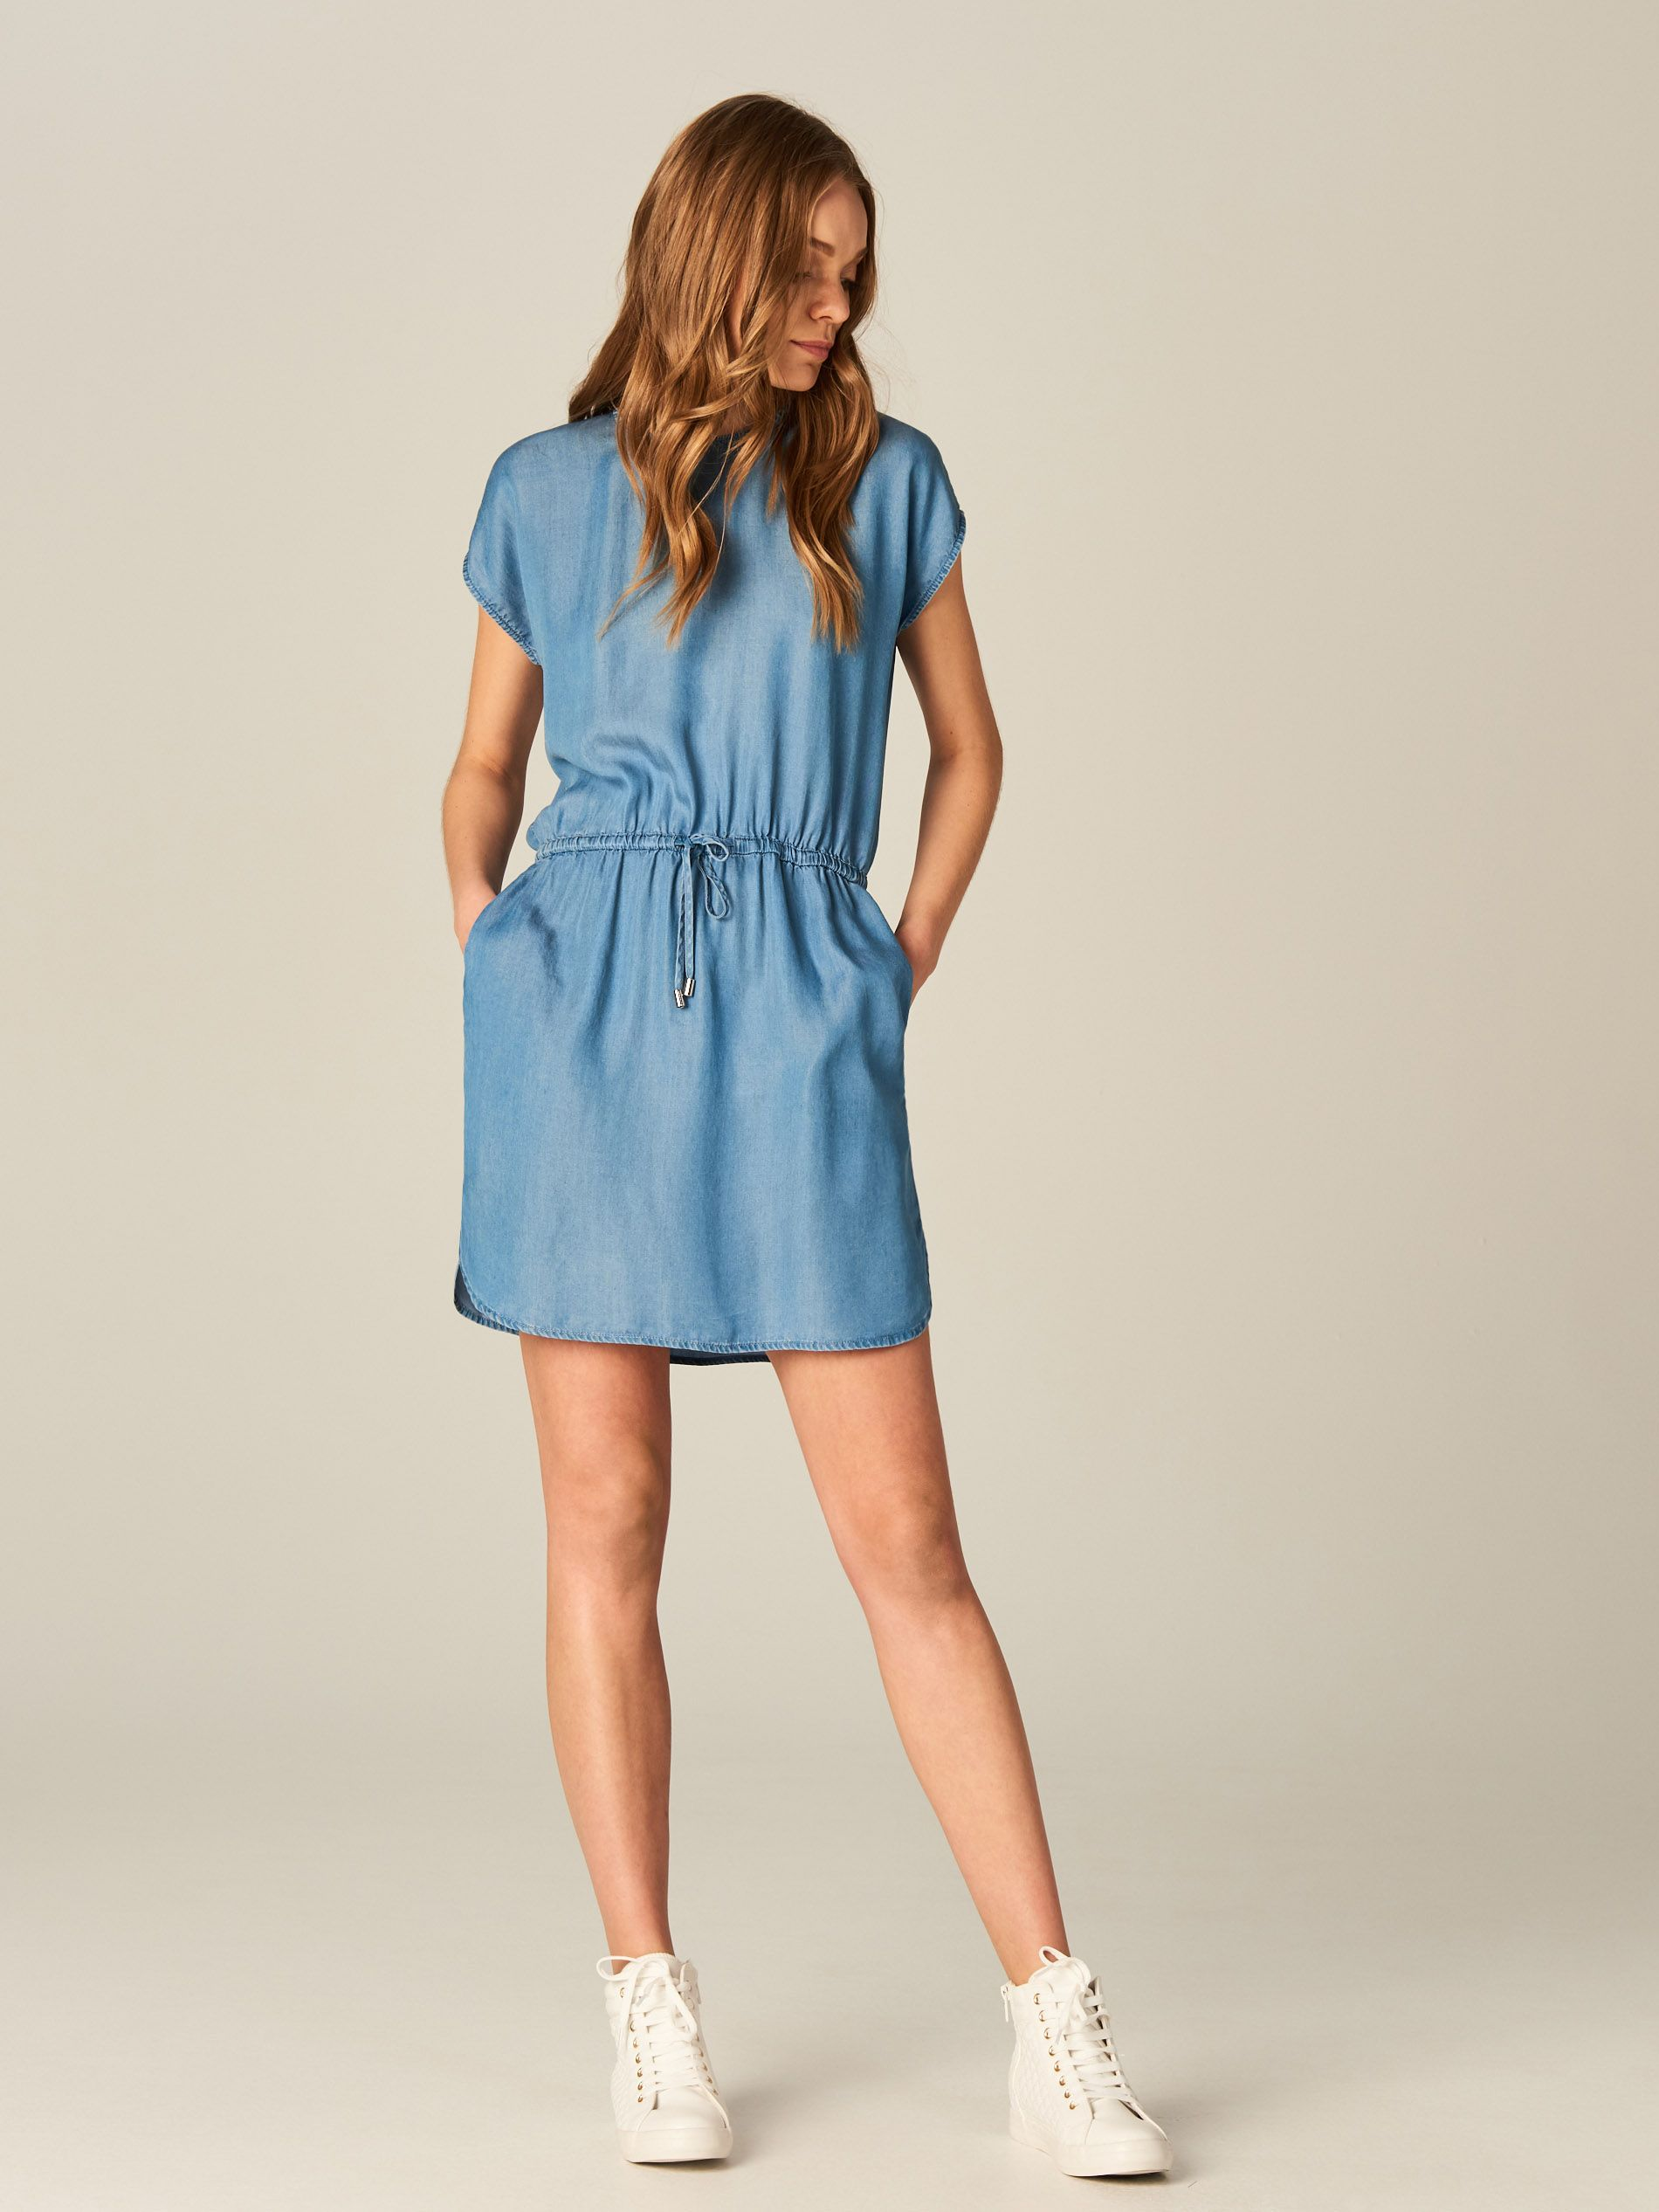 015f5069 Lekka denimowa sukienka, SUKIENKI, KOMBINEZONY, niebieski, MOHITO ...